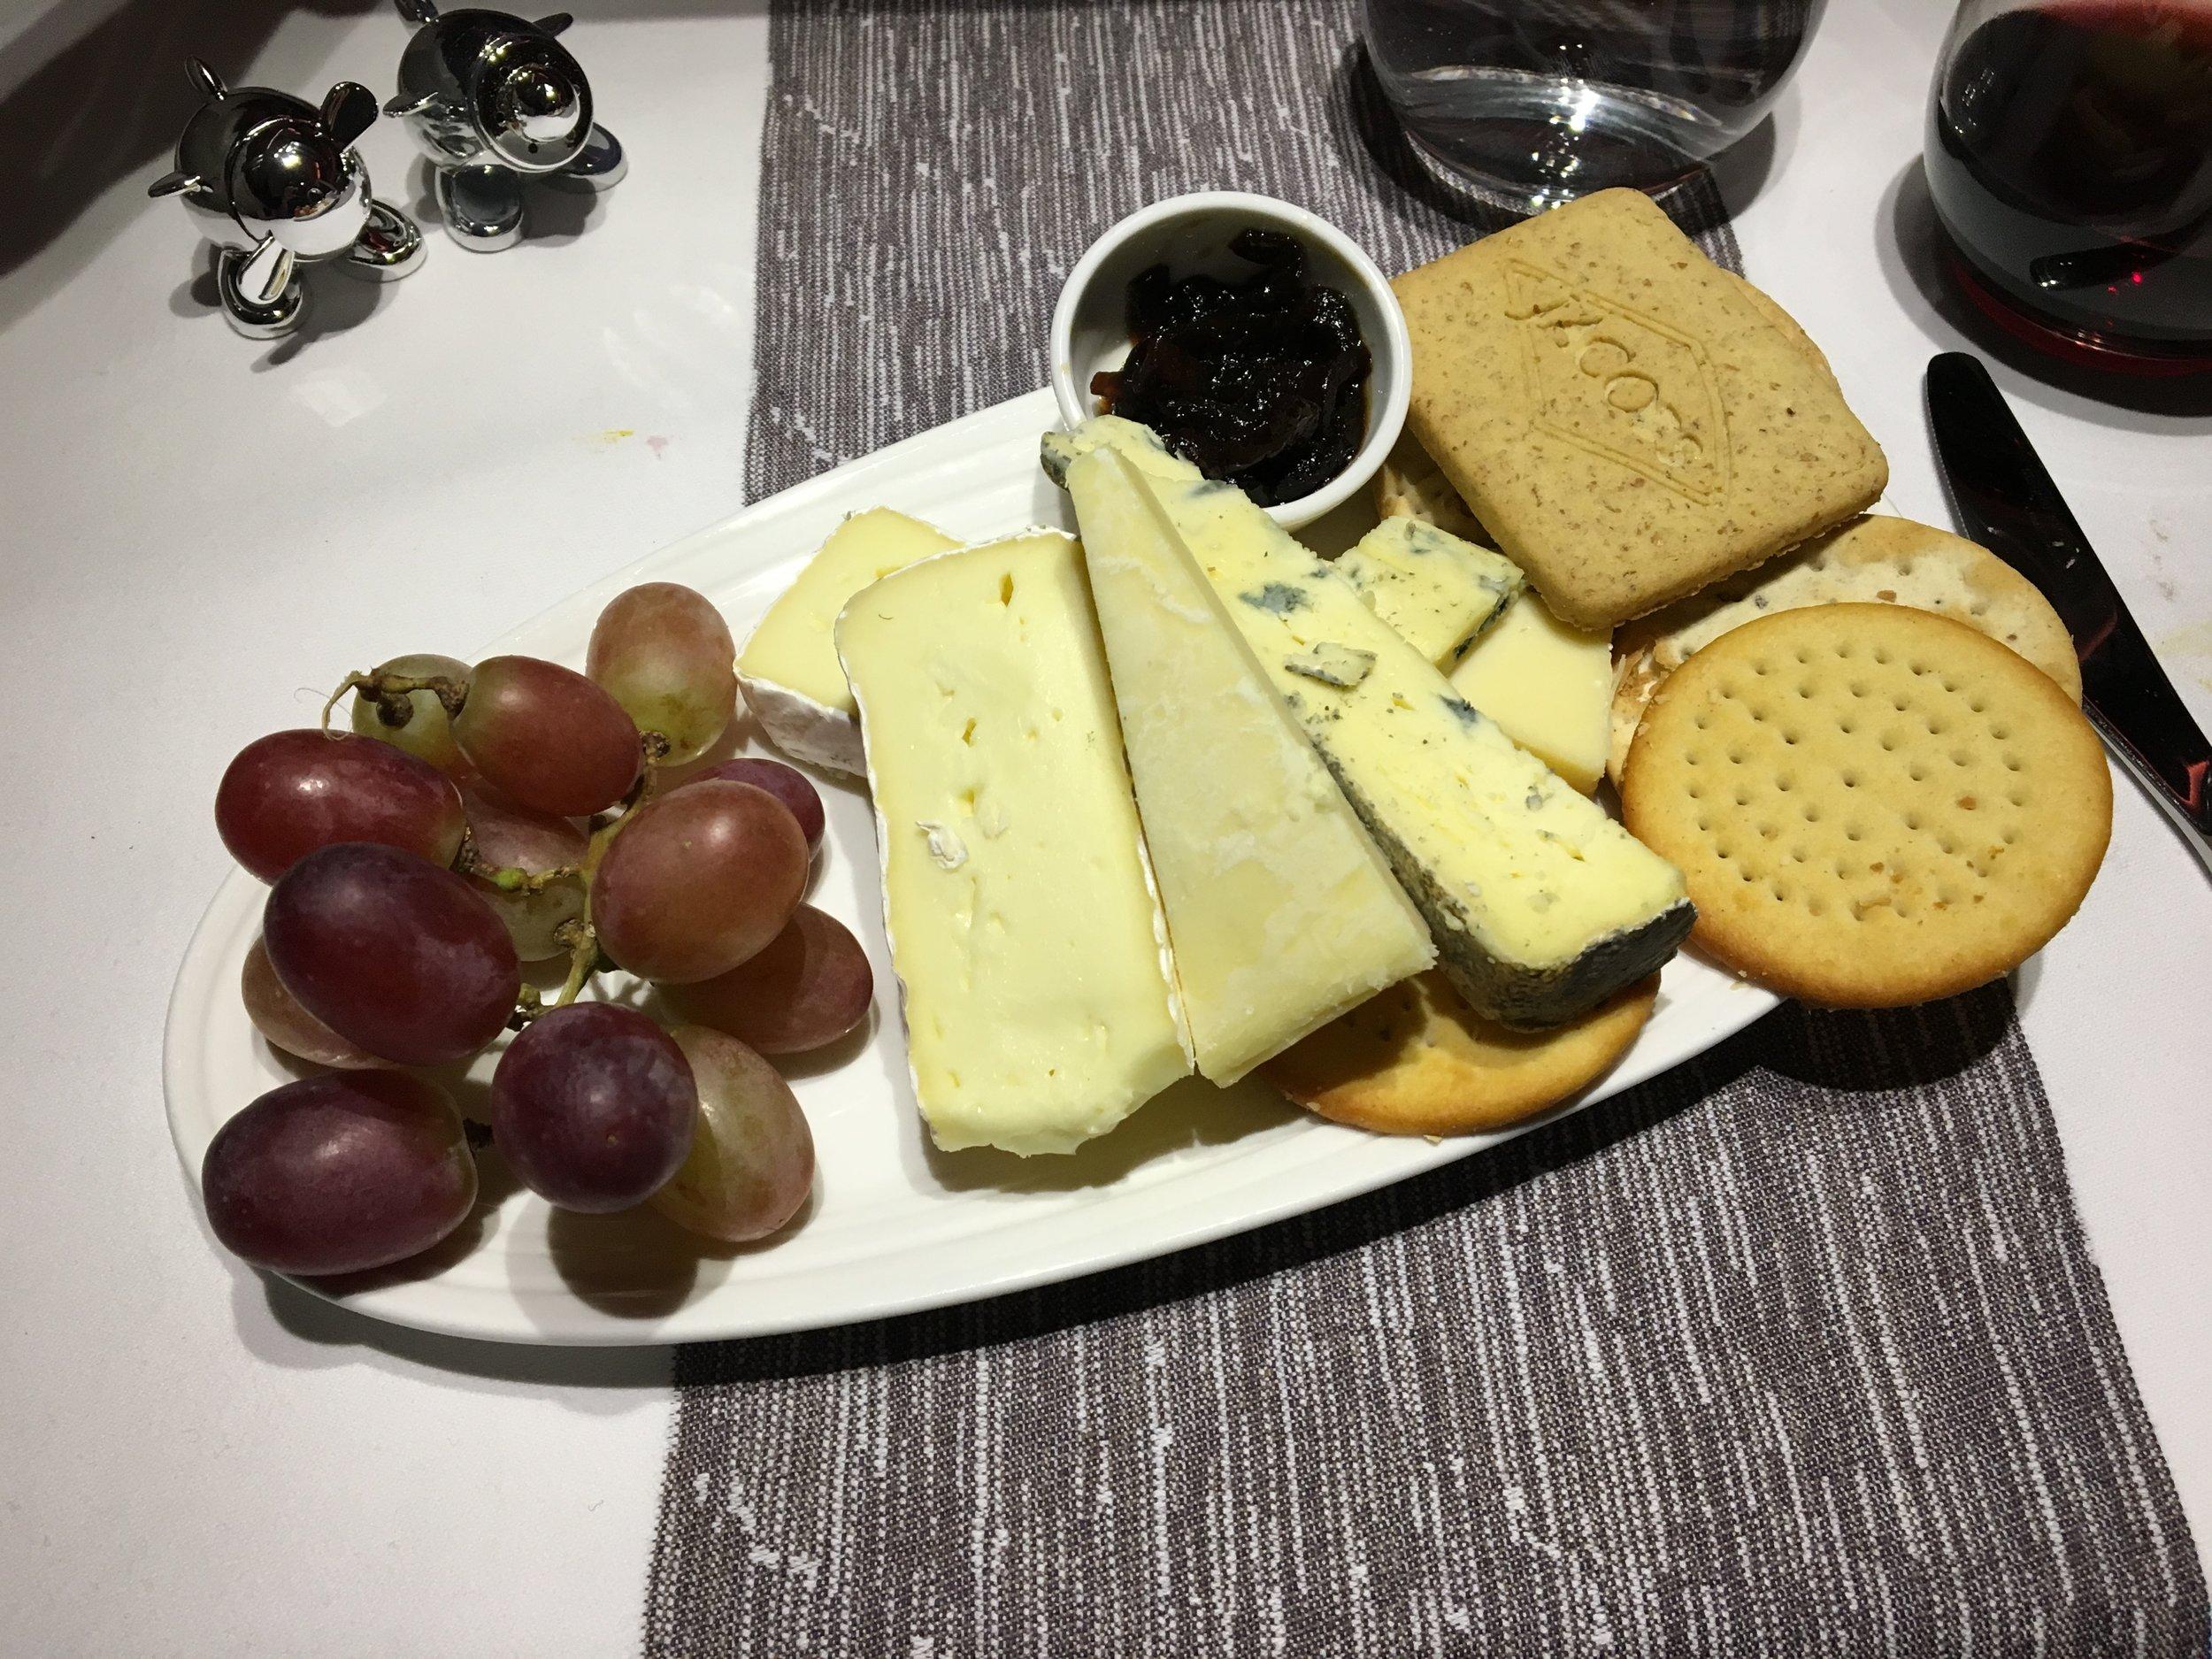 VIRGIN ATLANTIC UPPER CLASS cheese & crackers